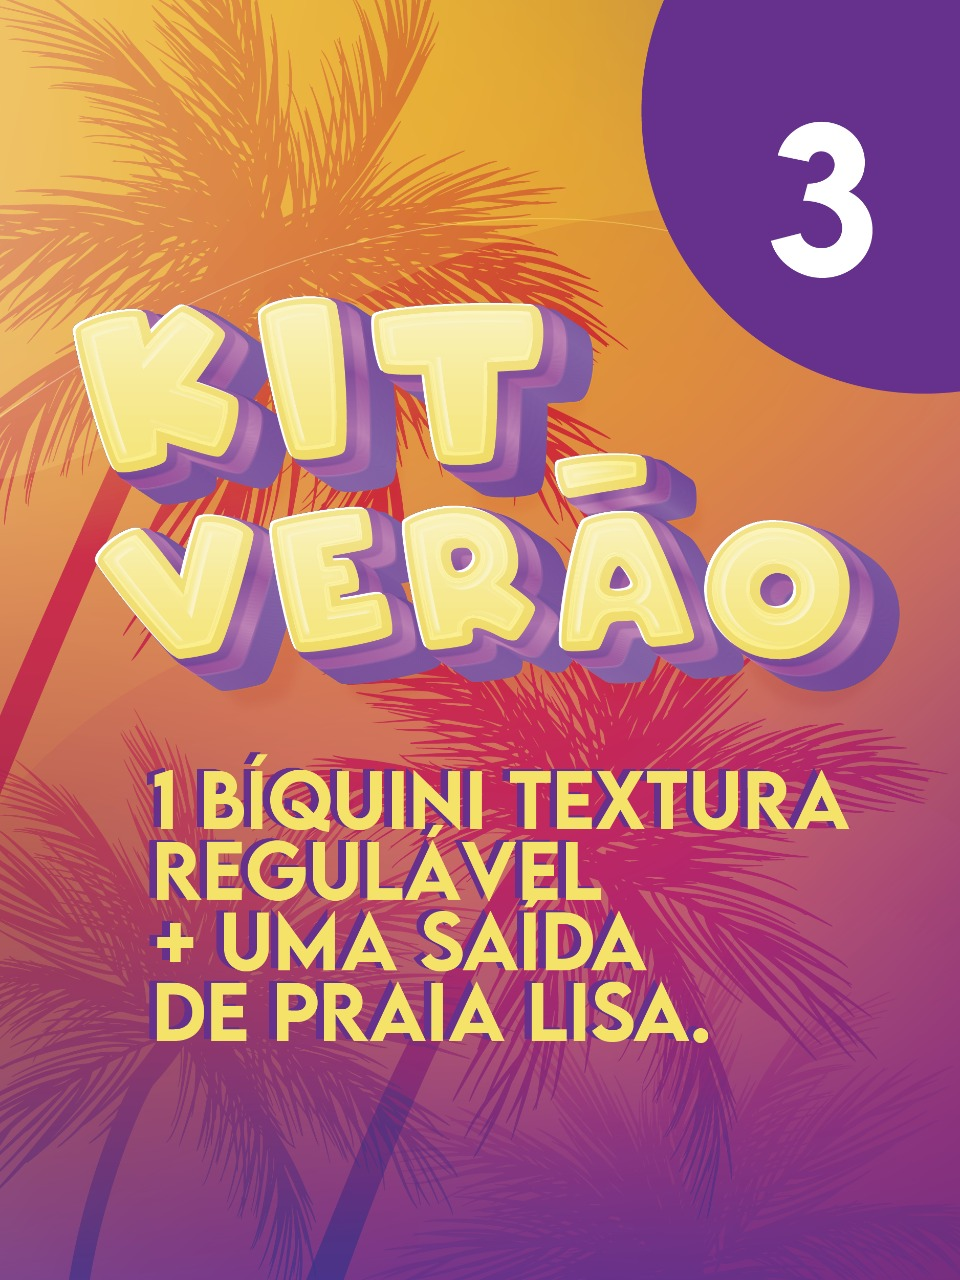 Kit Verão Stilus ♥ (3)